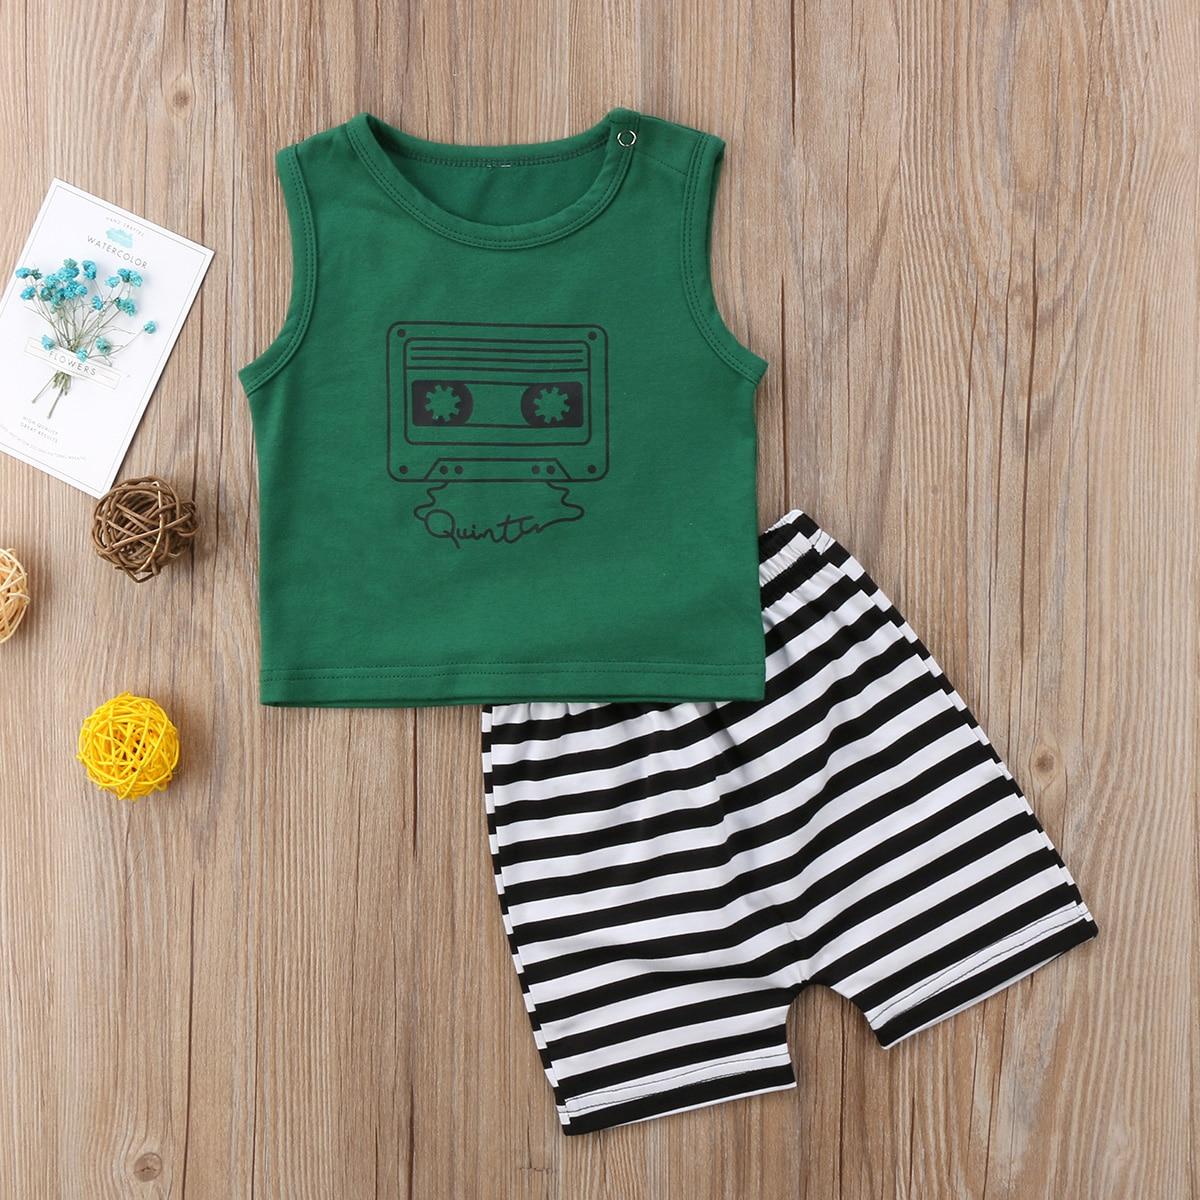 2 Stks Jongetje Zomer Groen T-shirt Tops + Gestreepte Korte Broek Outfit Peuter Kids Zomer Kleding Set Yu